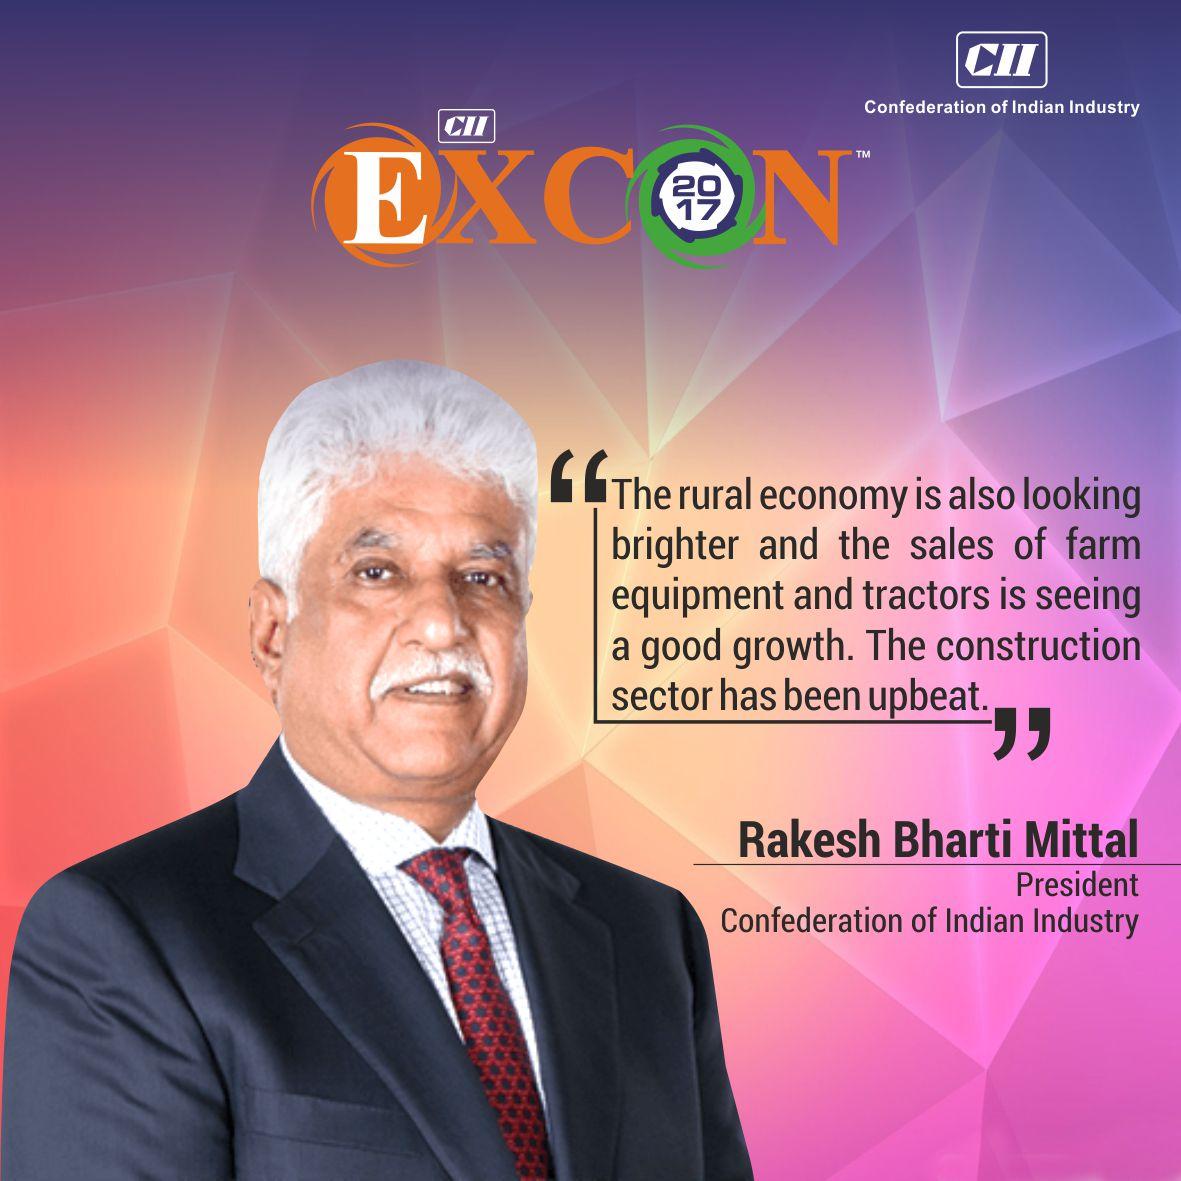 CII EXCON on Twitter: